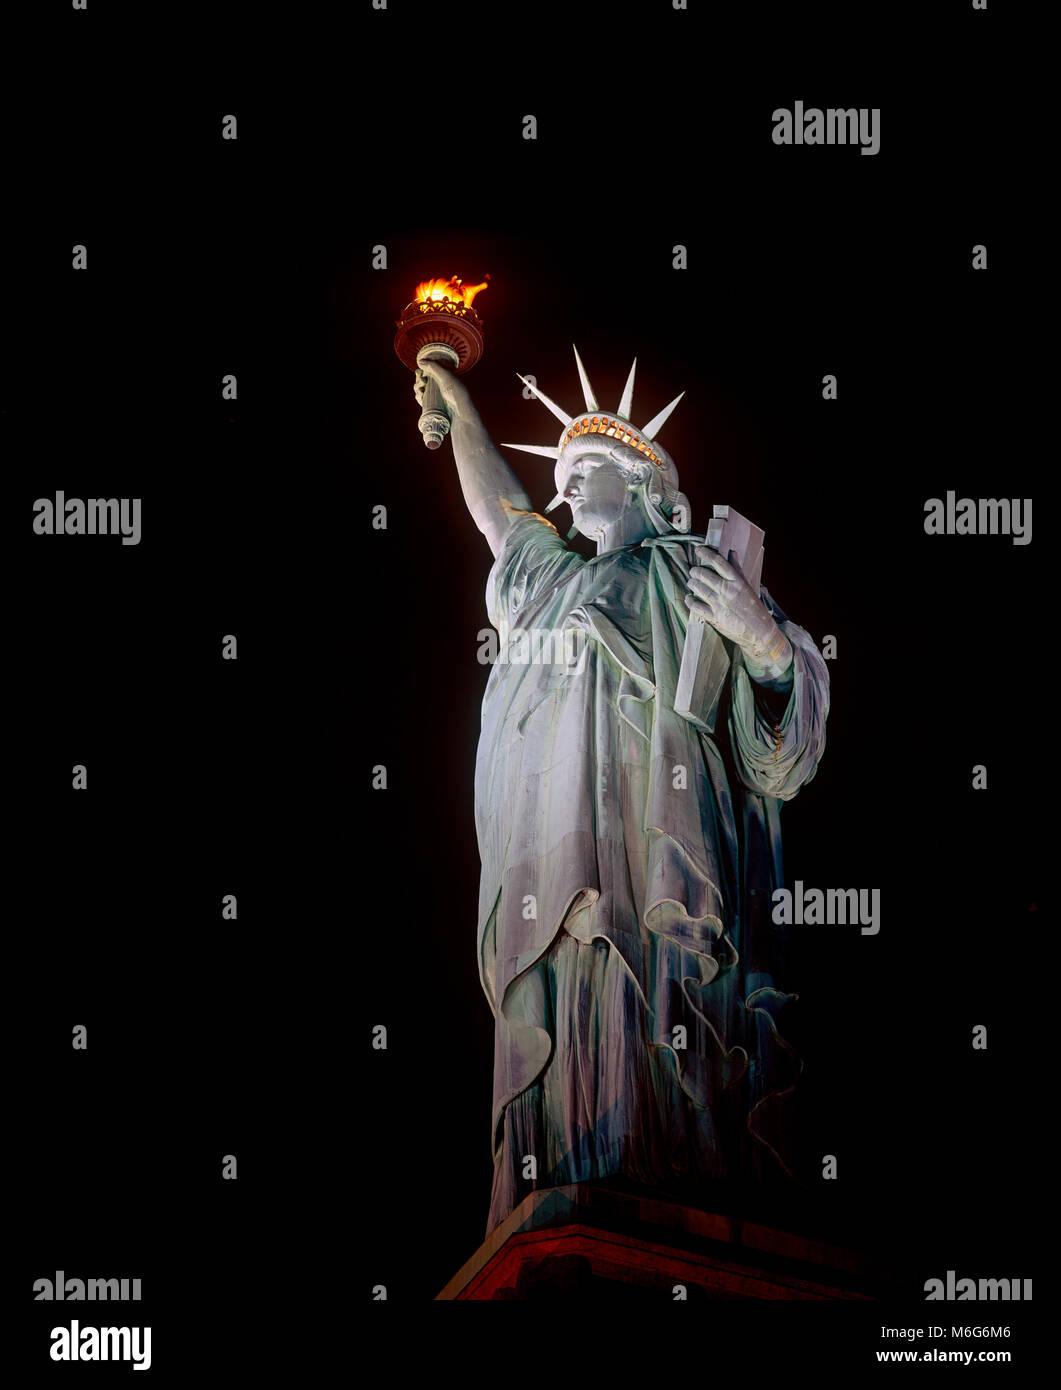 Statue of Liberty at night, New York - Stock Image